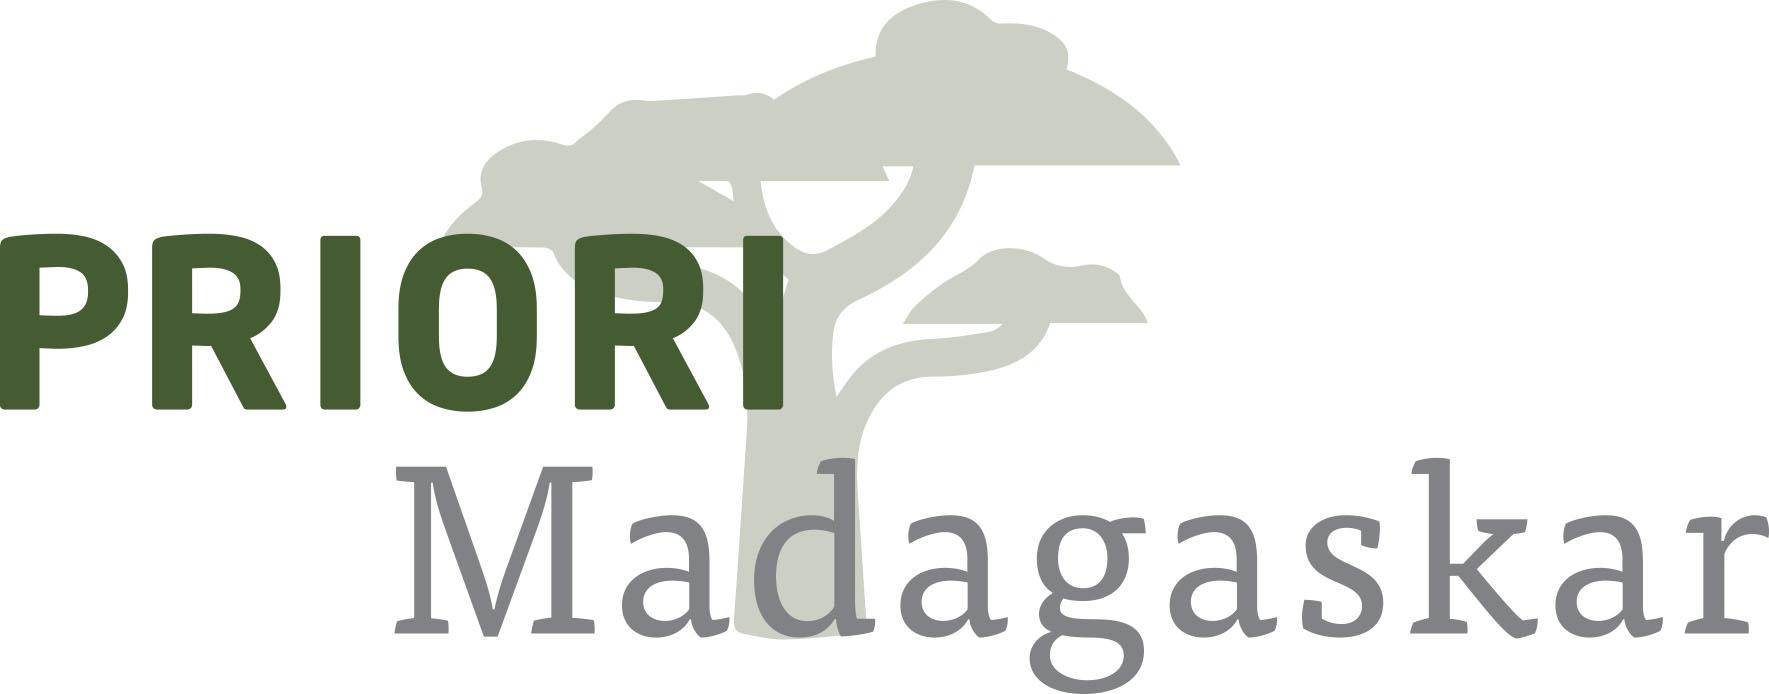 PRIORI. Die Reiseorganisation für Madagaskar Reisen, Madagaskarhaus Basel